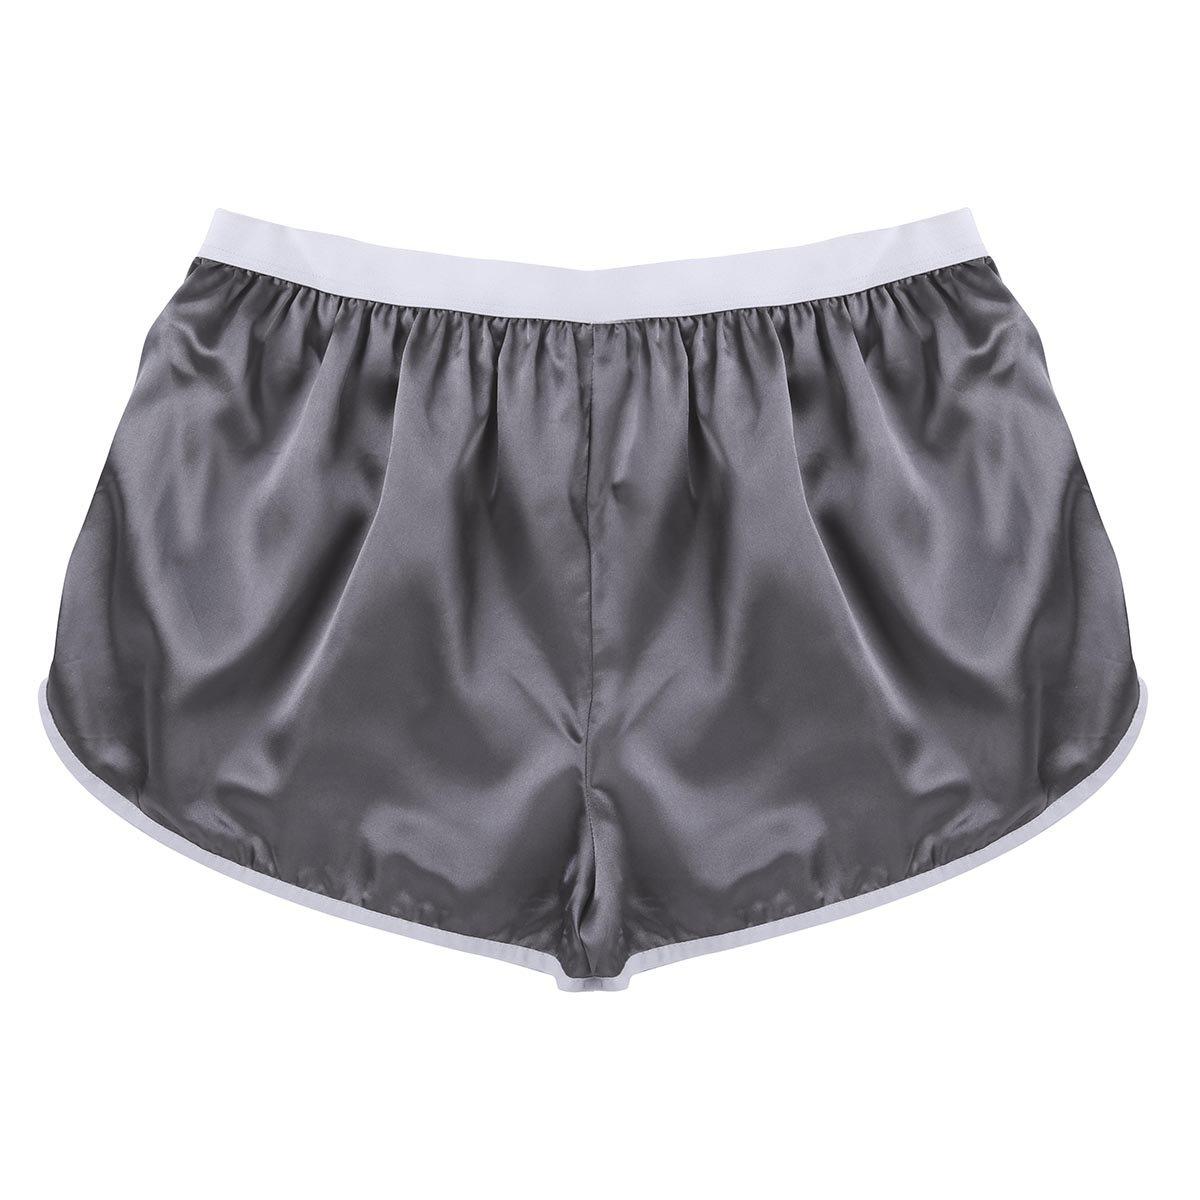 YiZYiF Men's Summer Silk Shorts Frilly Satin Boxer Briefs Casual Loose Underwear Silver-Gray Large(Waist 27.0-50.0''/69-126cm)